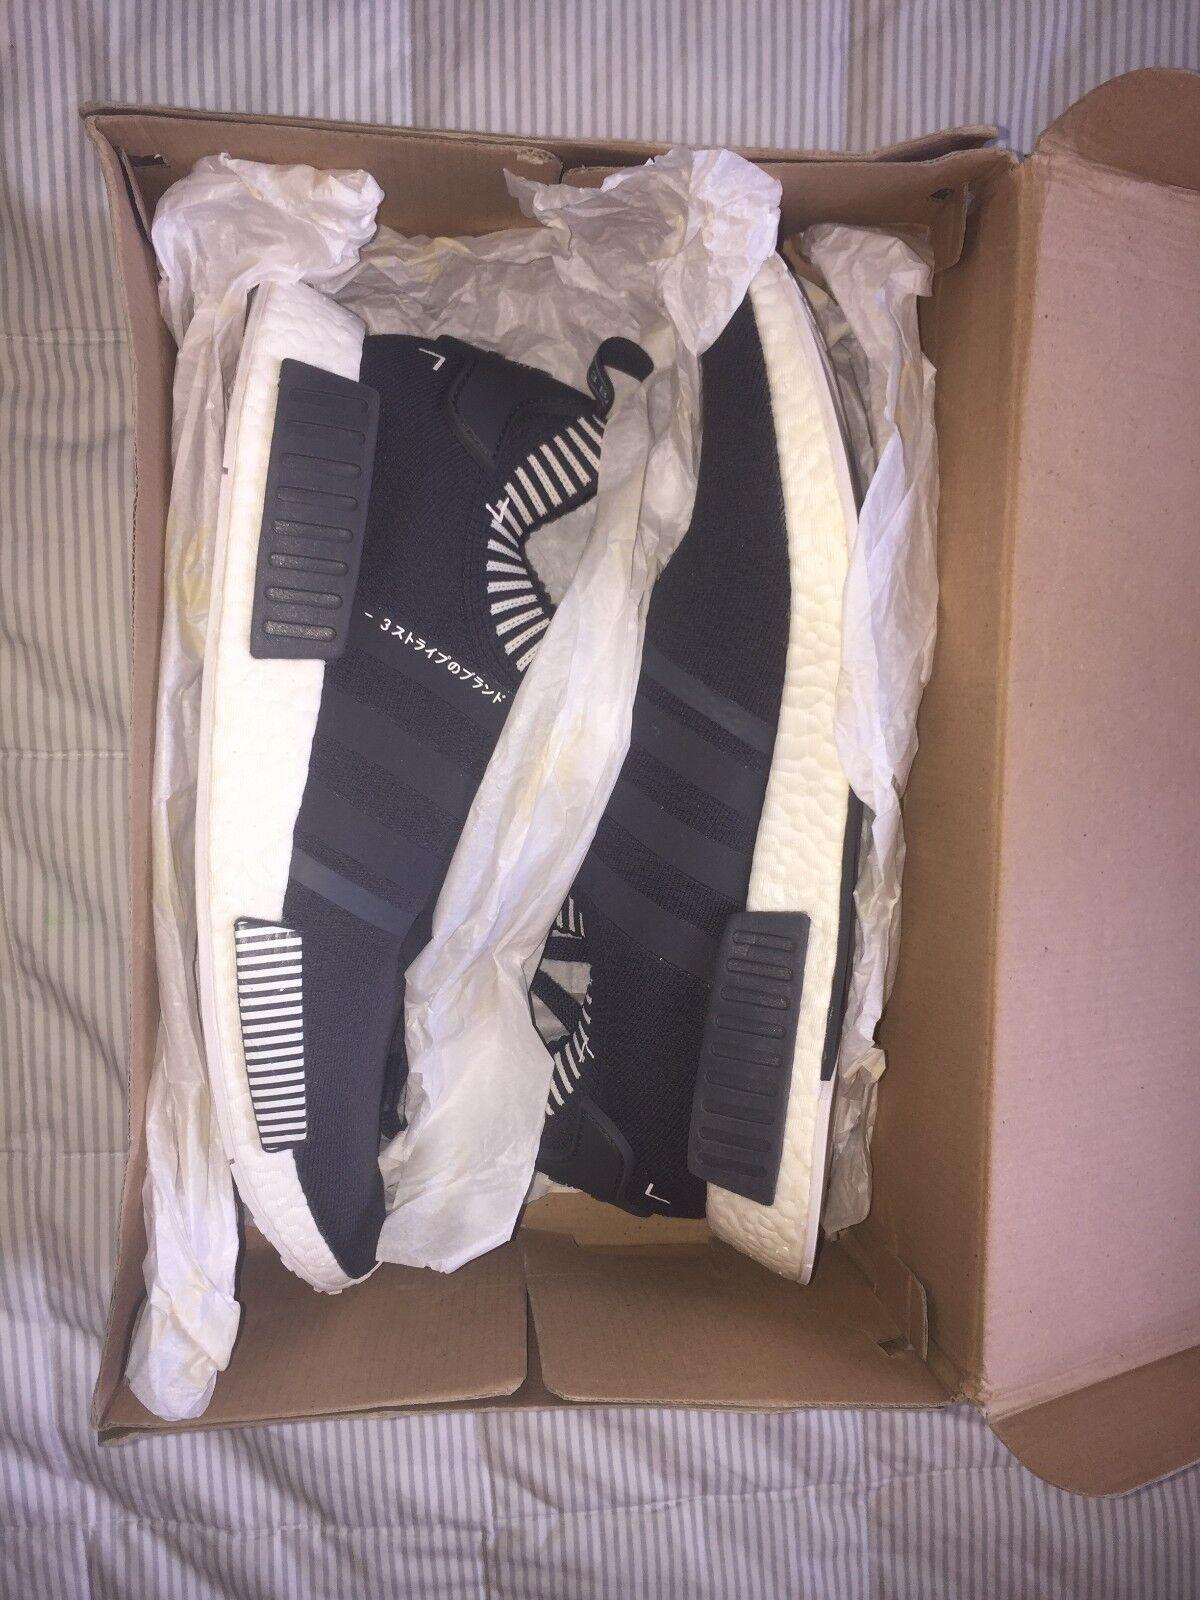 Used: Adidas Originals NMD R1 PK Japan Grey, Mens Size 12.5